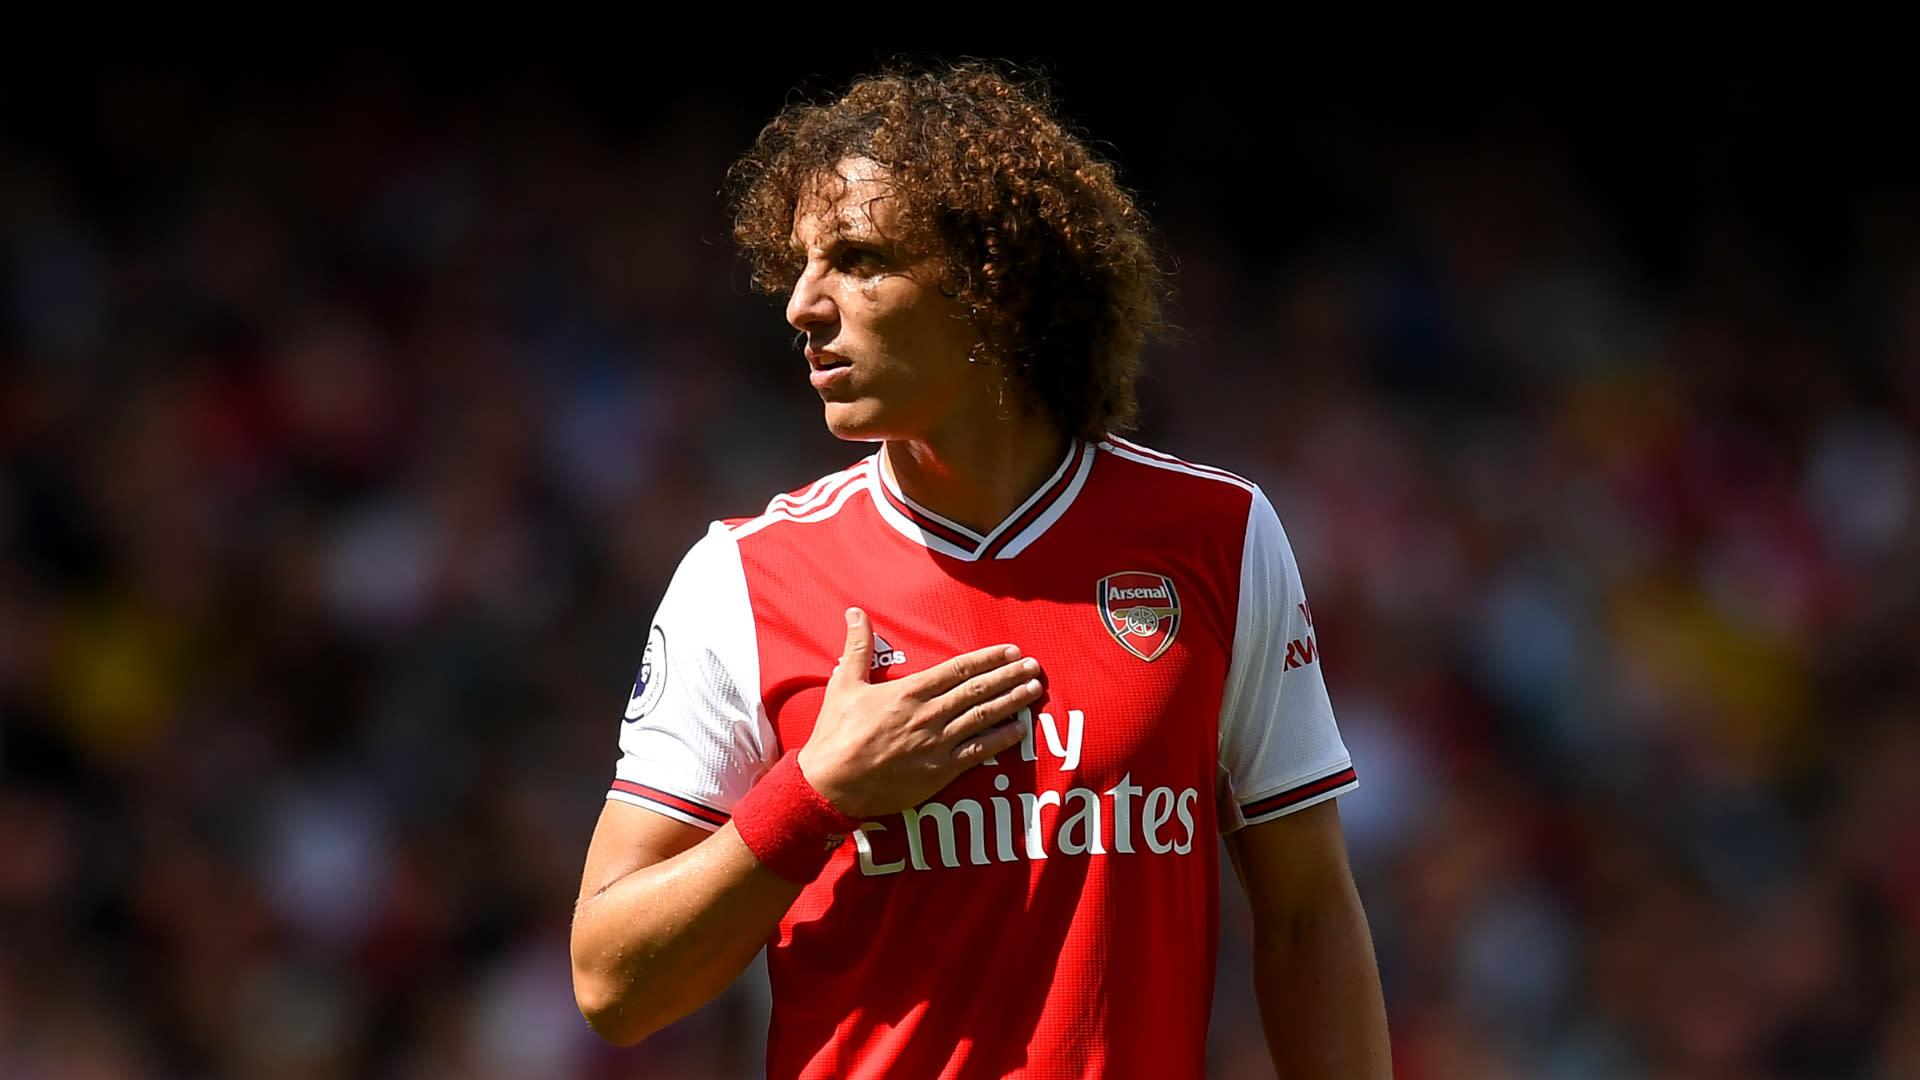 David Luiz: Ambition the reason for leaving Chelsea